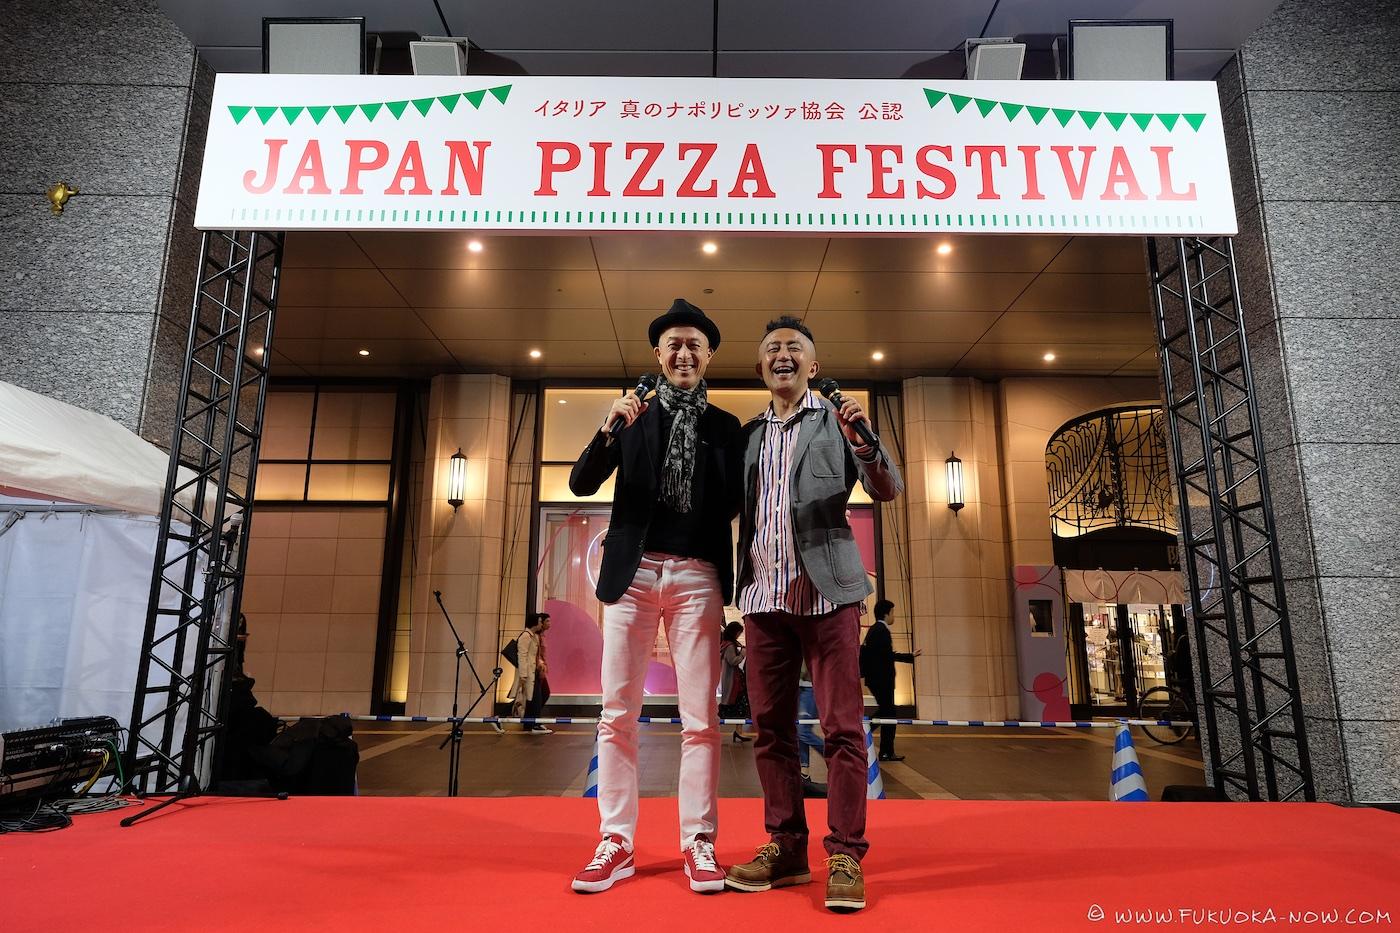 japan pizza festival, pizza, neapolitan, fukuoka